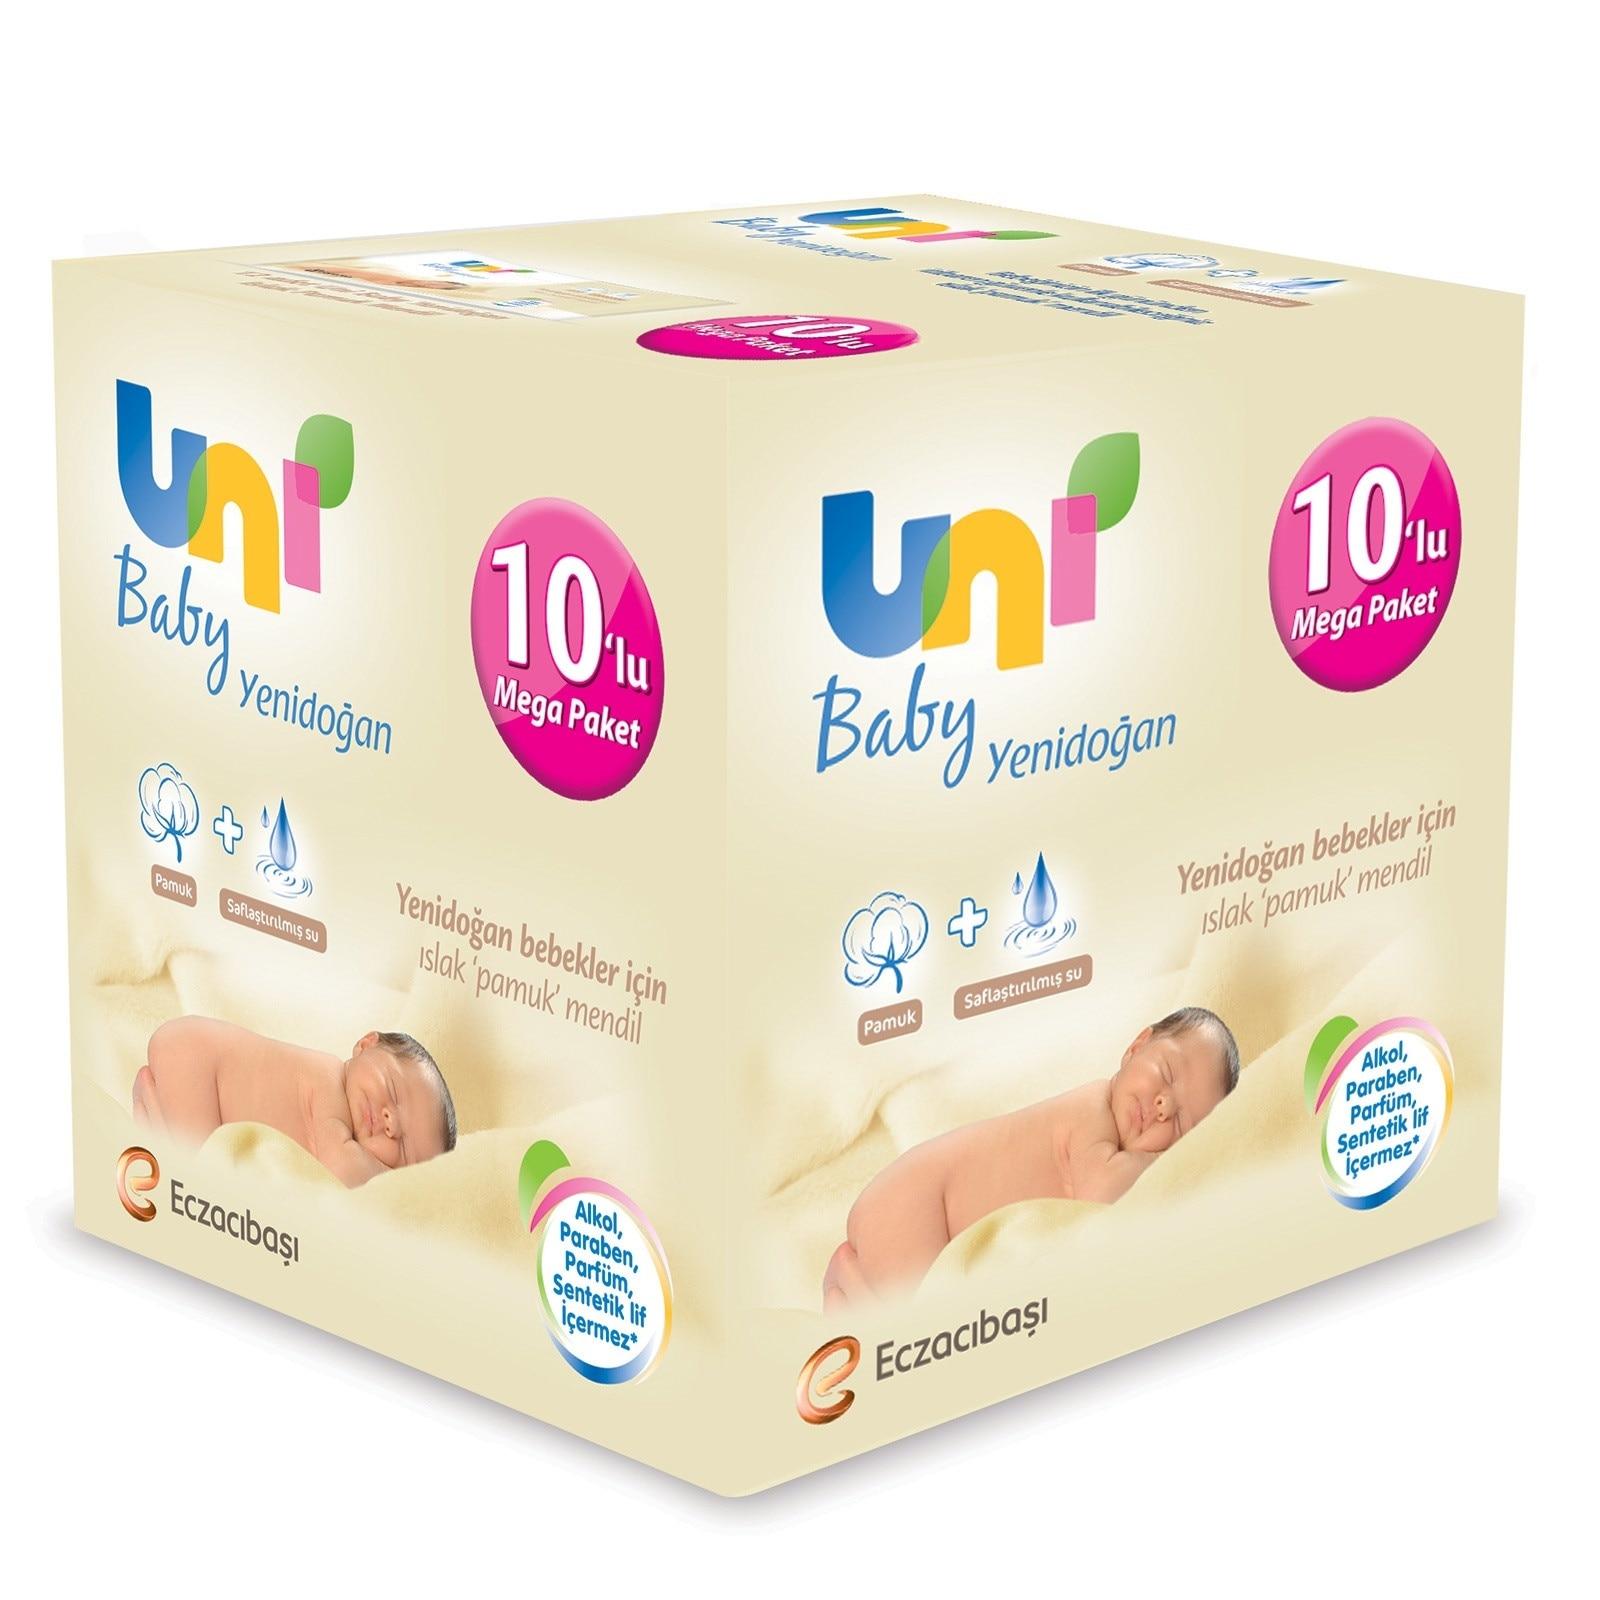 Ebebek Uni Baby Newborn Wet Cotton Wipes Mega Value Package 10x40 Pcs